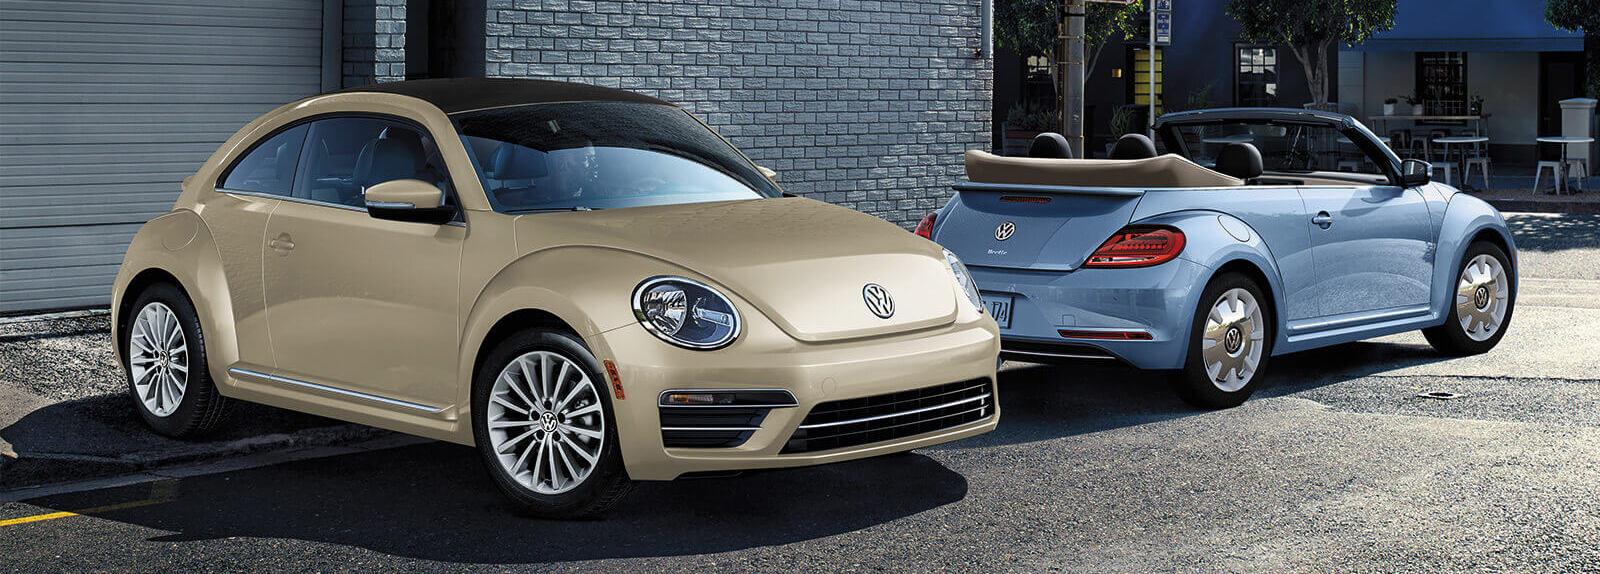 2019 Volkswagen Beetle for Sale near Atlantic City, NJ